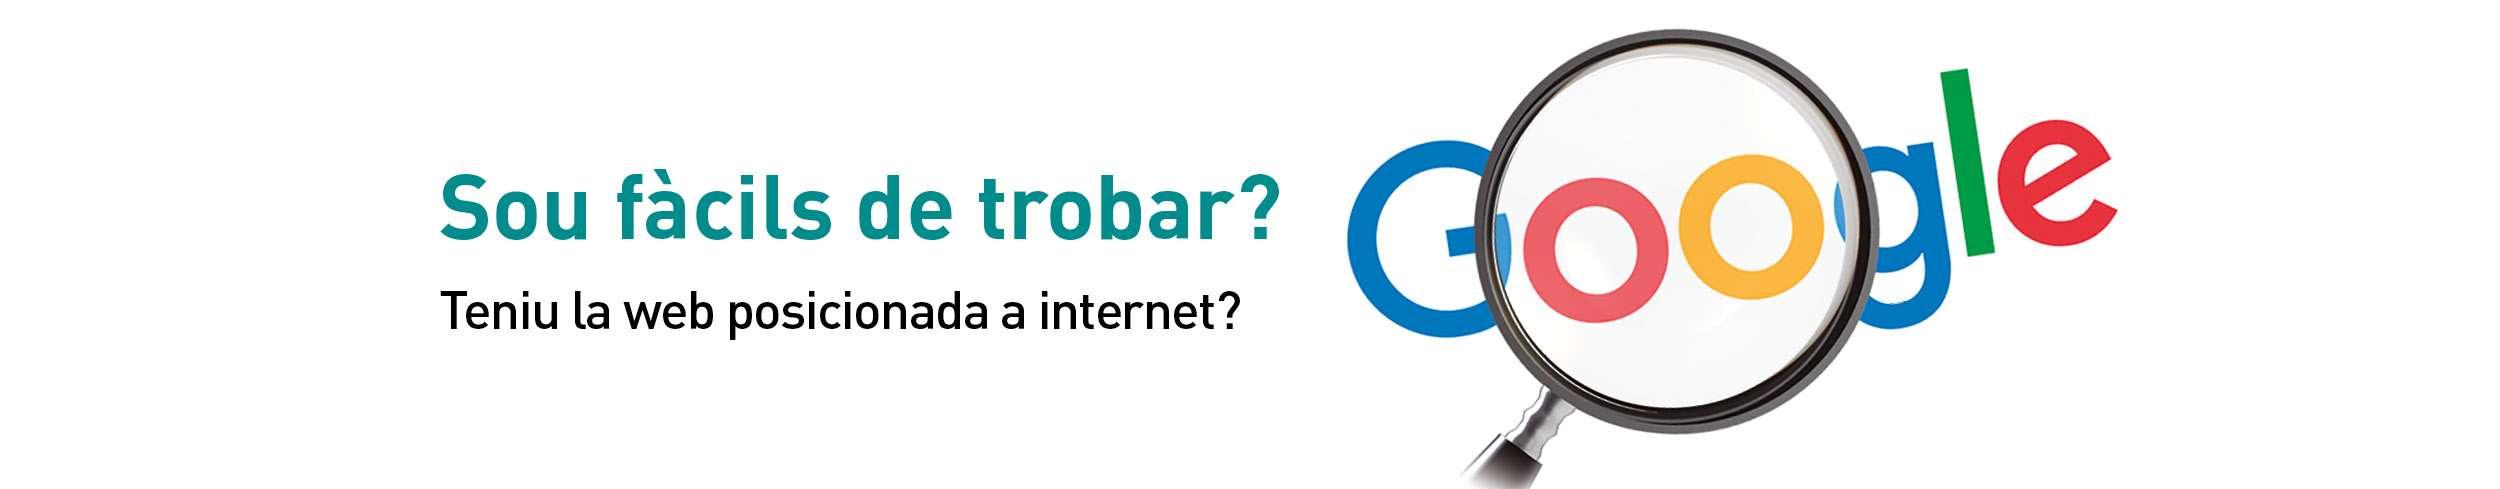 Banner web Creatib4